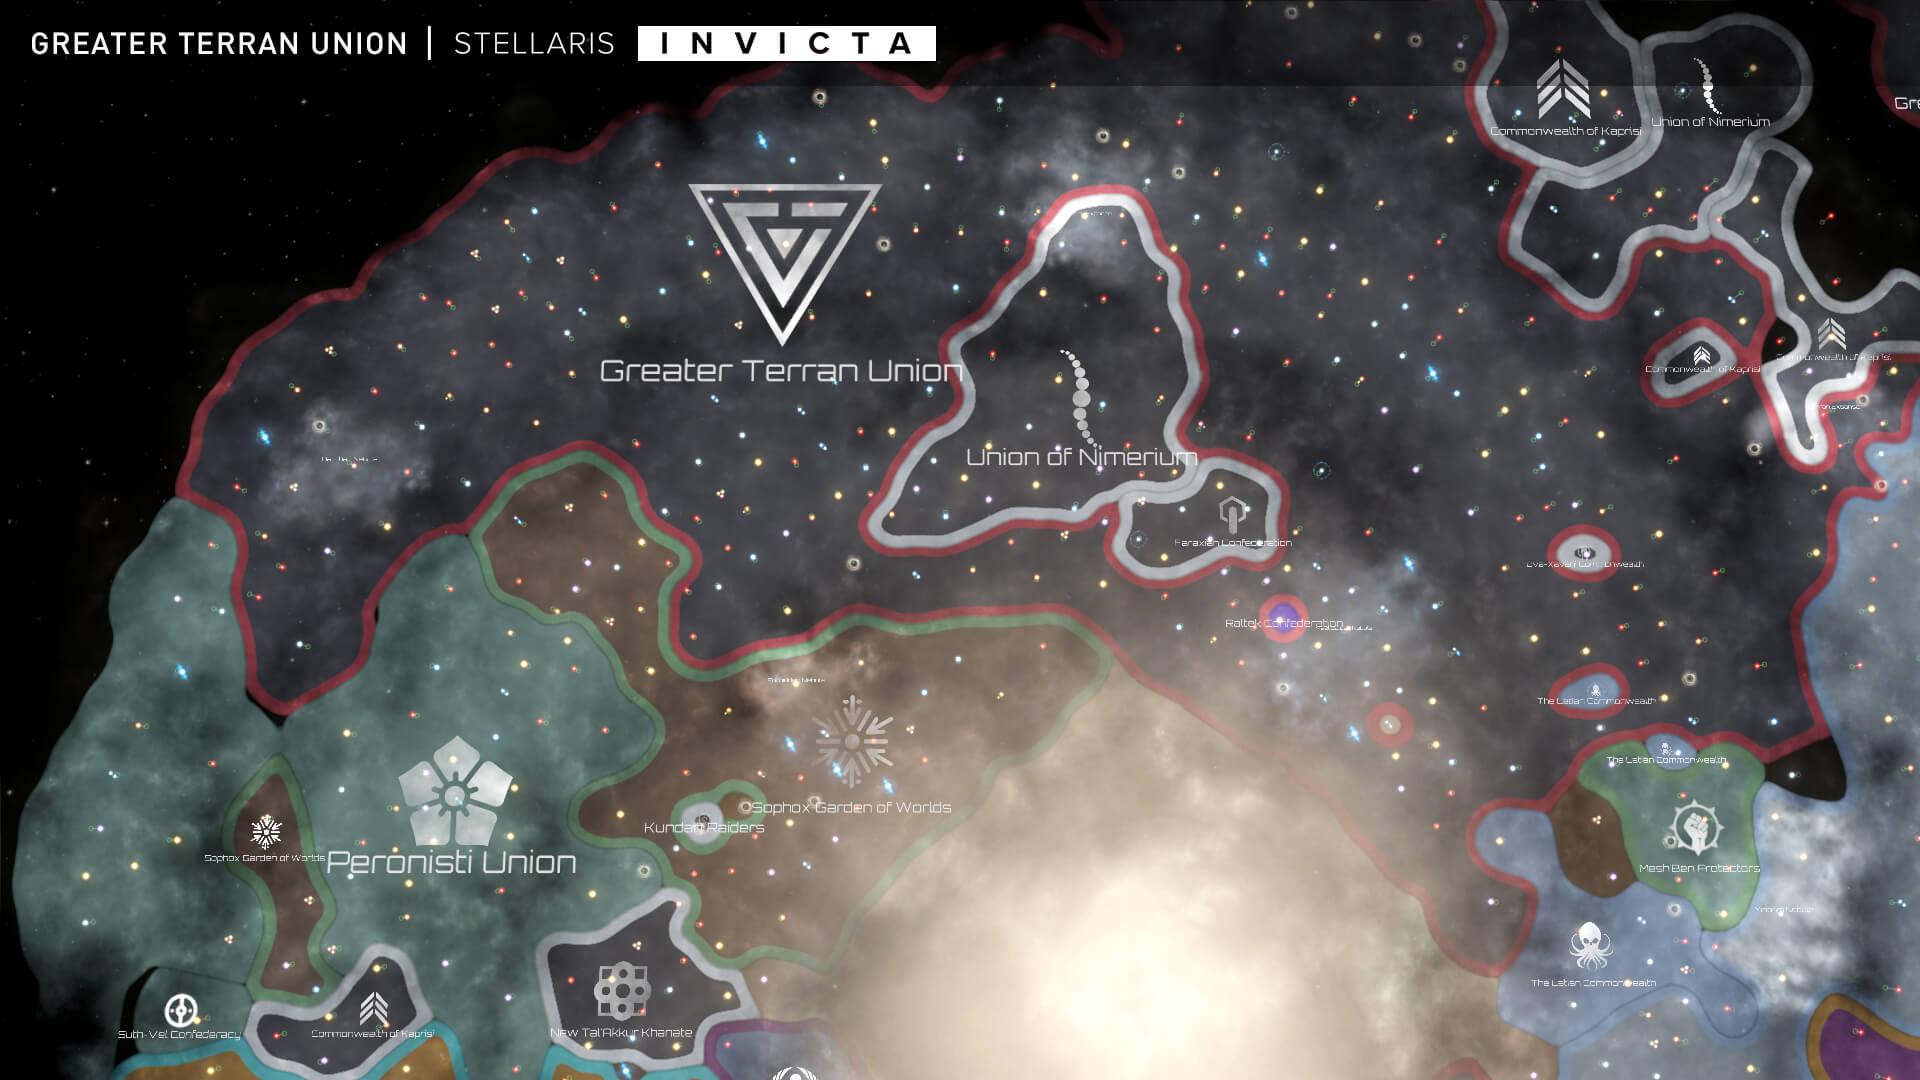 Stellaris - Greater Terran Union | Stellaris Invicta